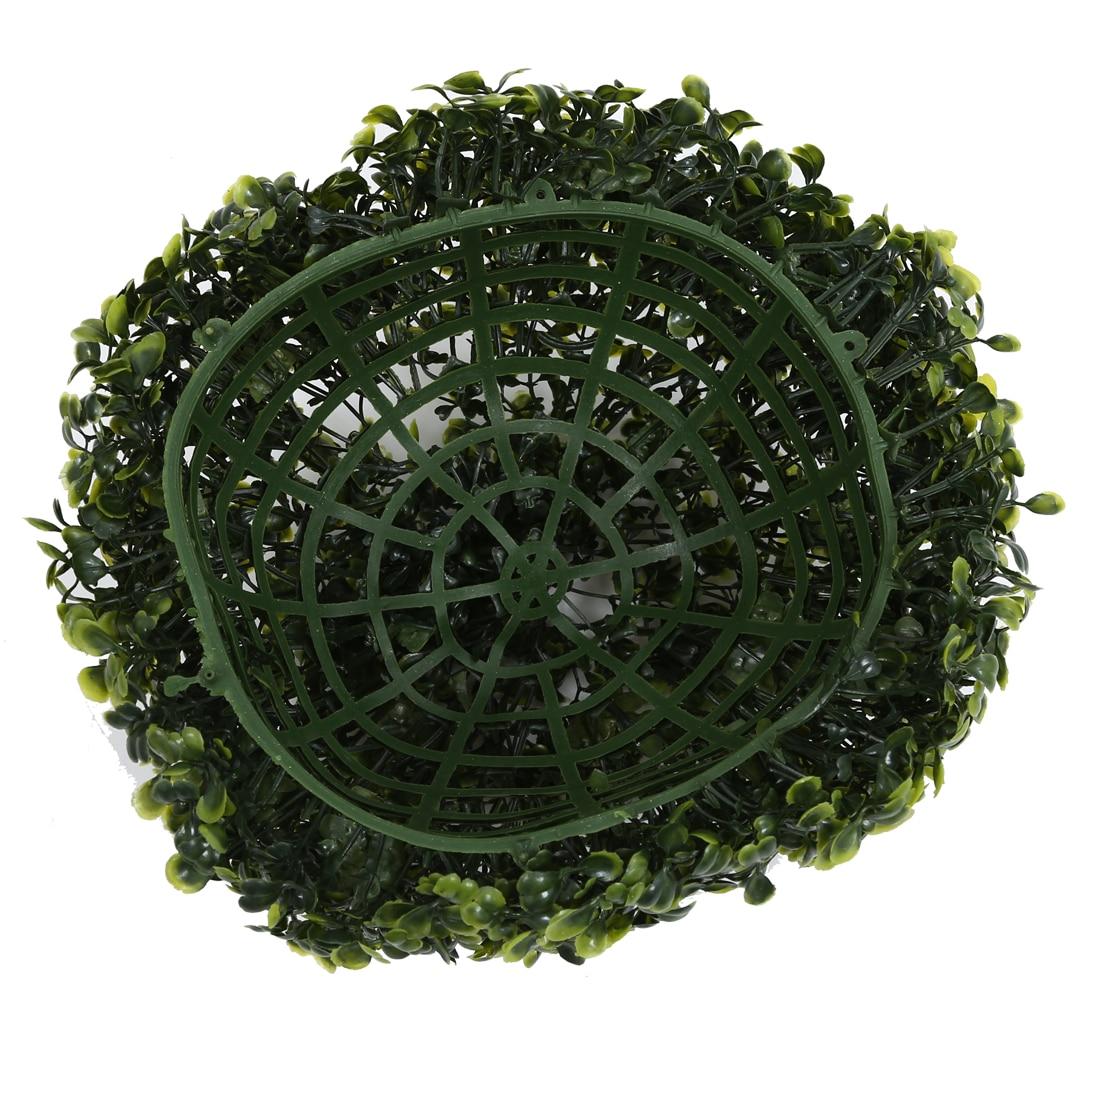 Artificial Green Hanging Grass Plant Ball Ornament Party Decoration Garden Home Decor Diy 30cm China